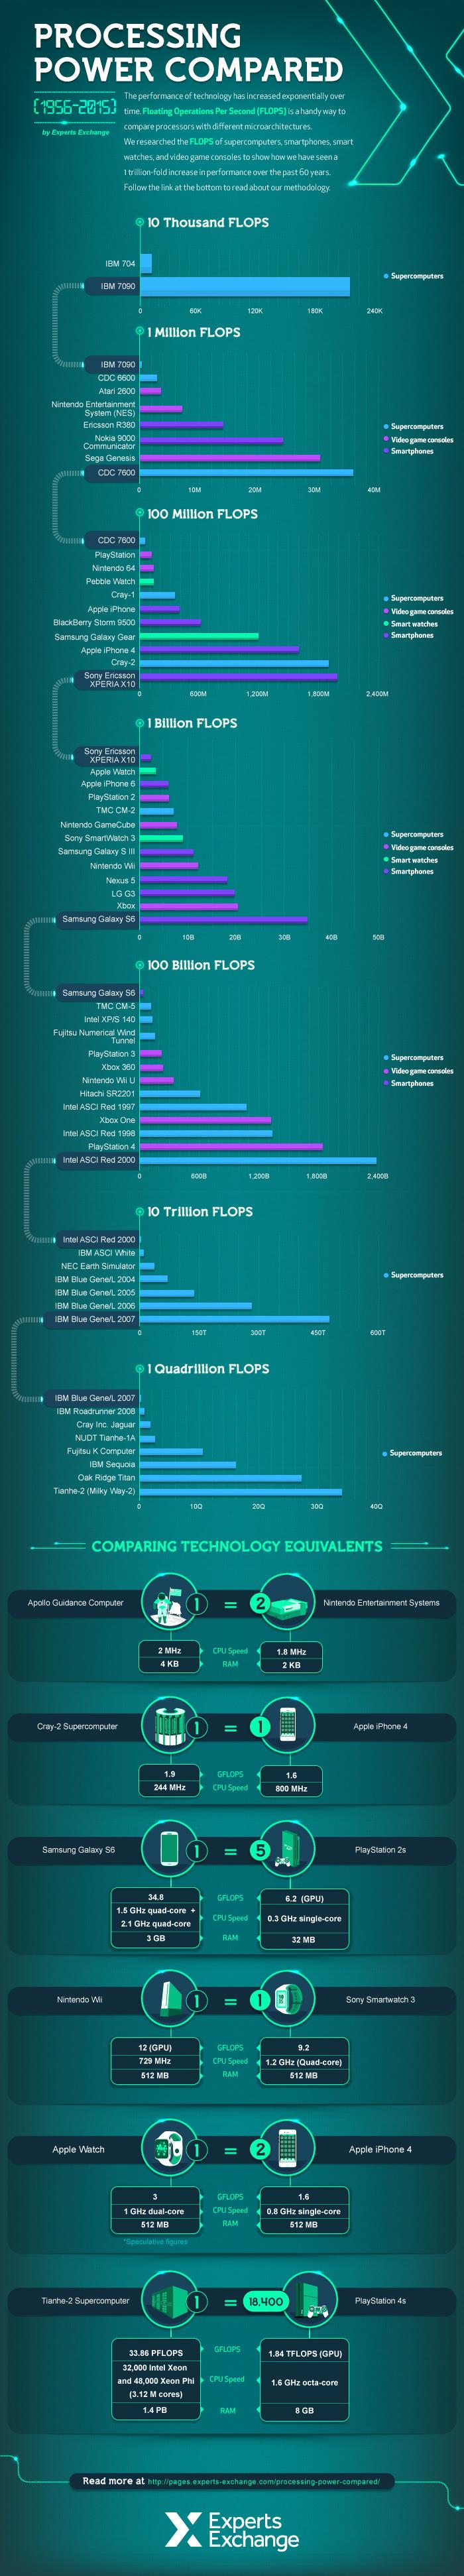 infografica galaxy s6 potenza